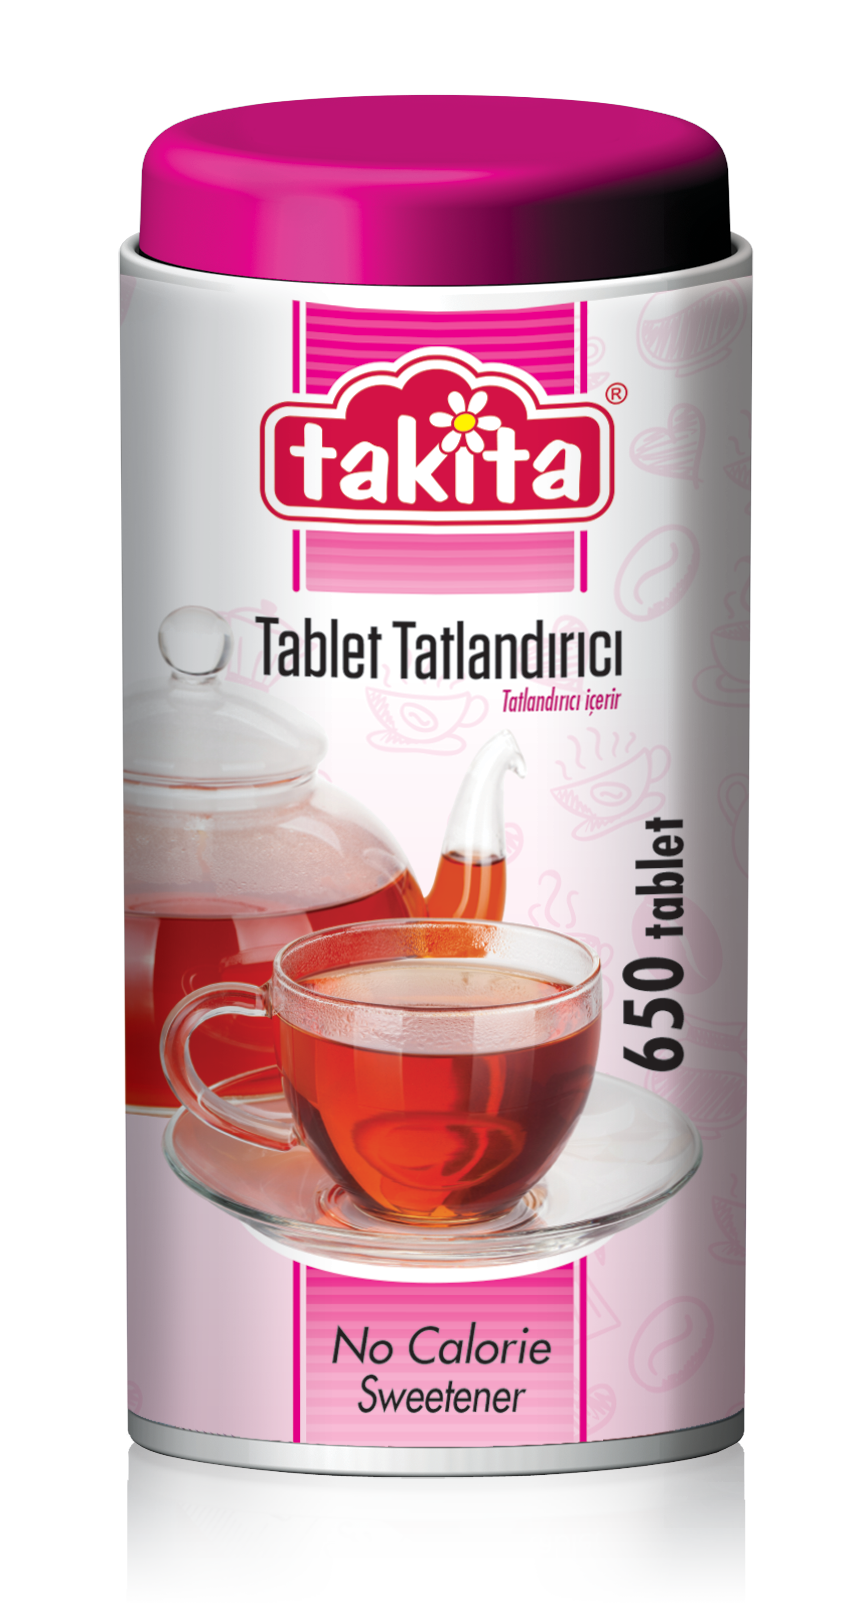 Takita Tablet Sweetener with Saccharine 650 Tablets